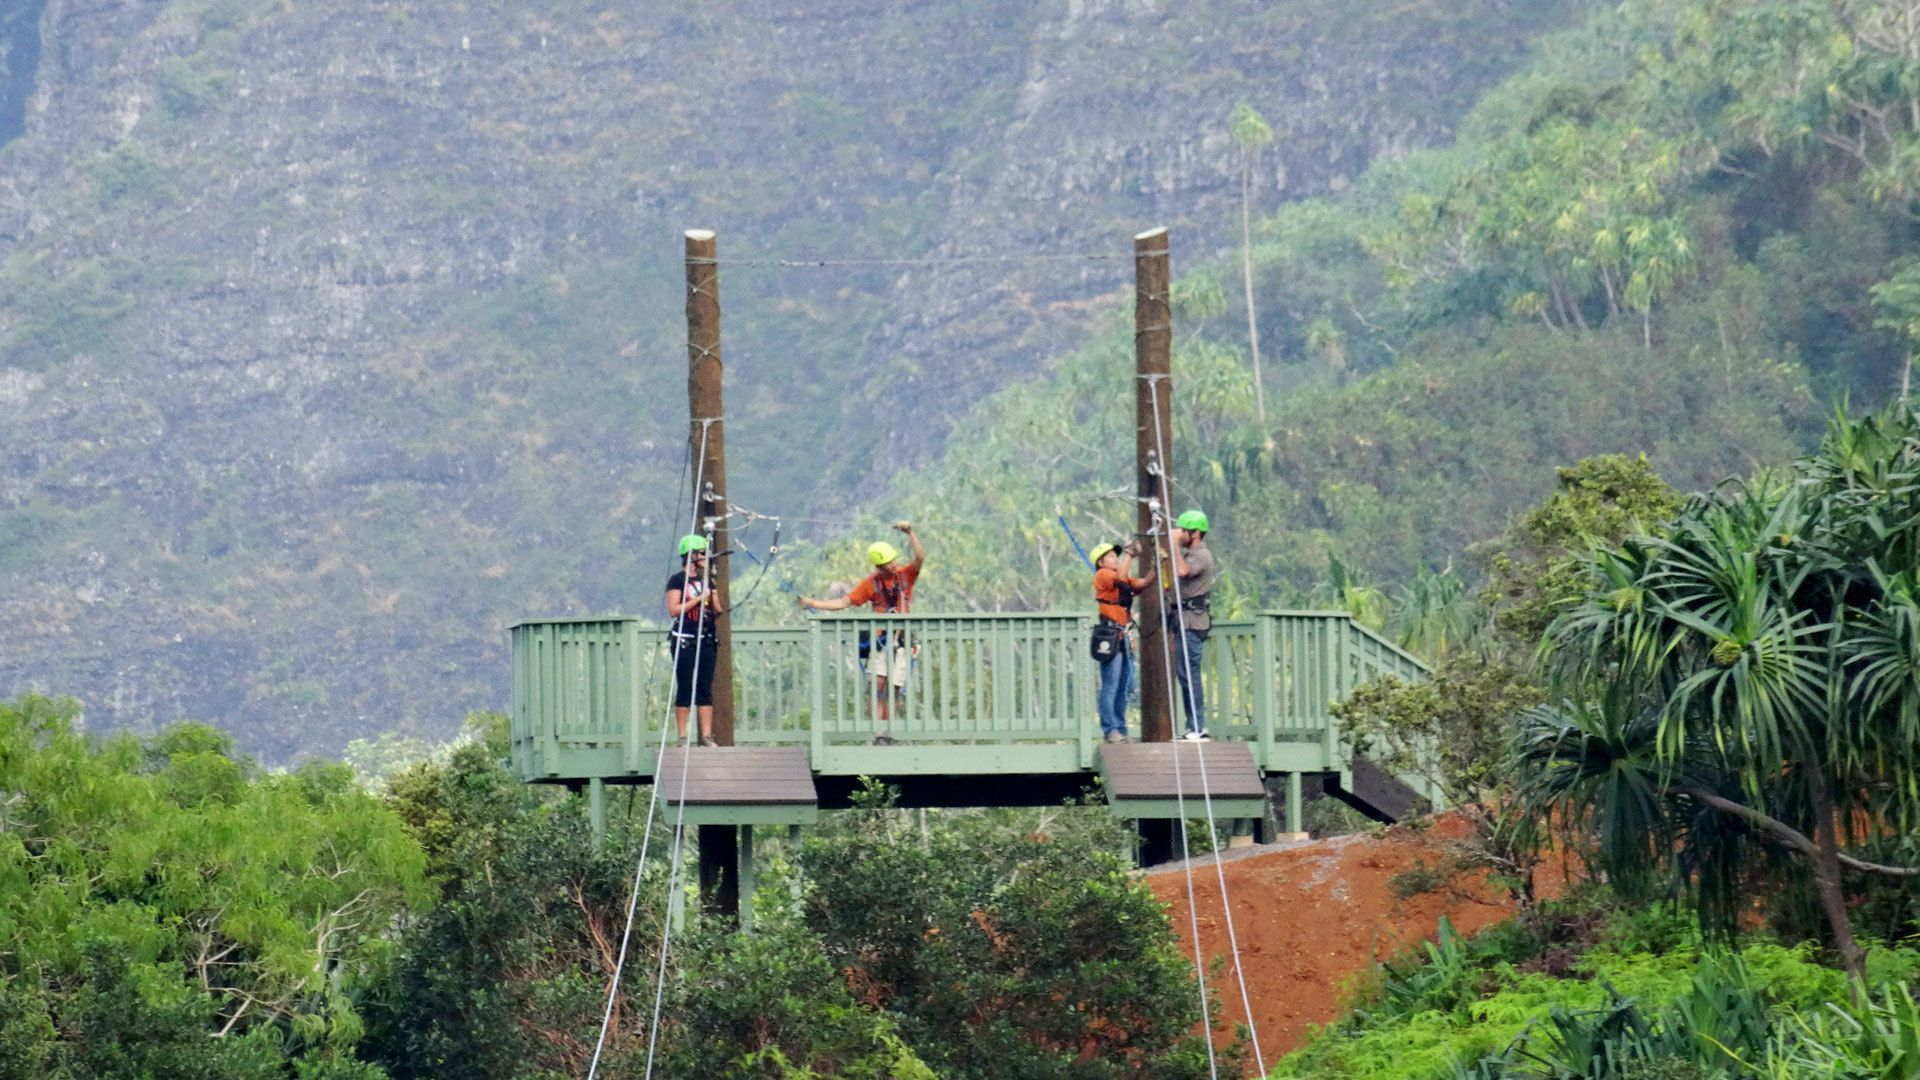 People getting ready to zipline on Oahu